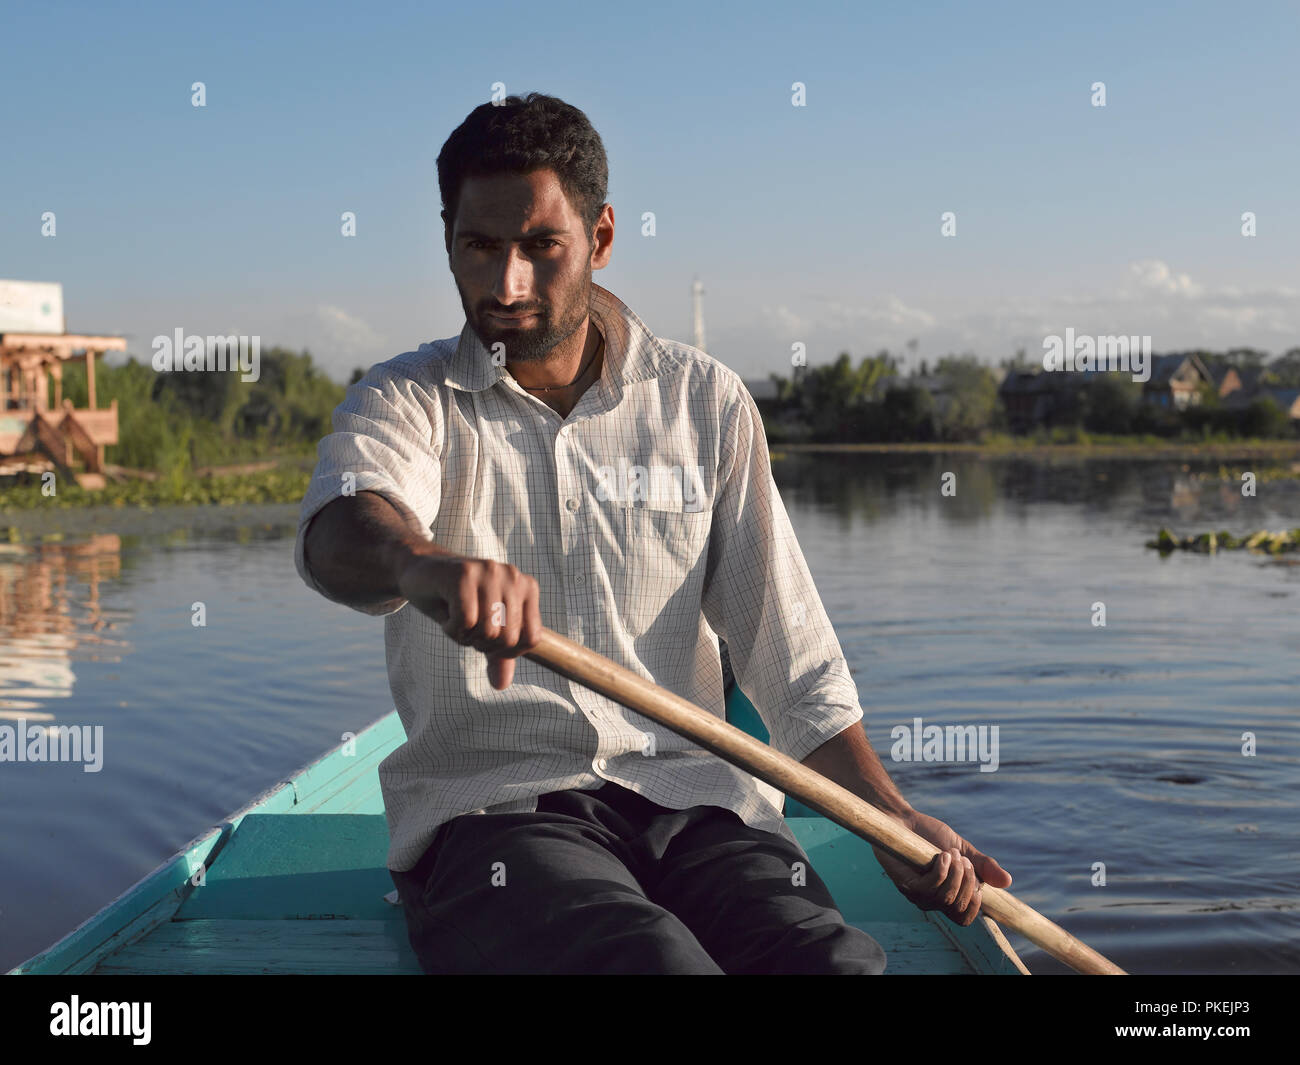 A Kashimiri man rows a boat used for tourist rides on Dal Lake, SRINAGAR, KASHMIR, INDIA, ASIA Stock Photo